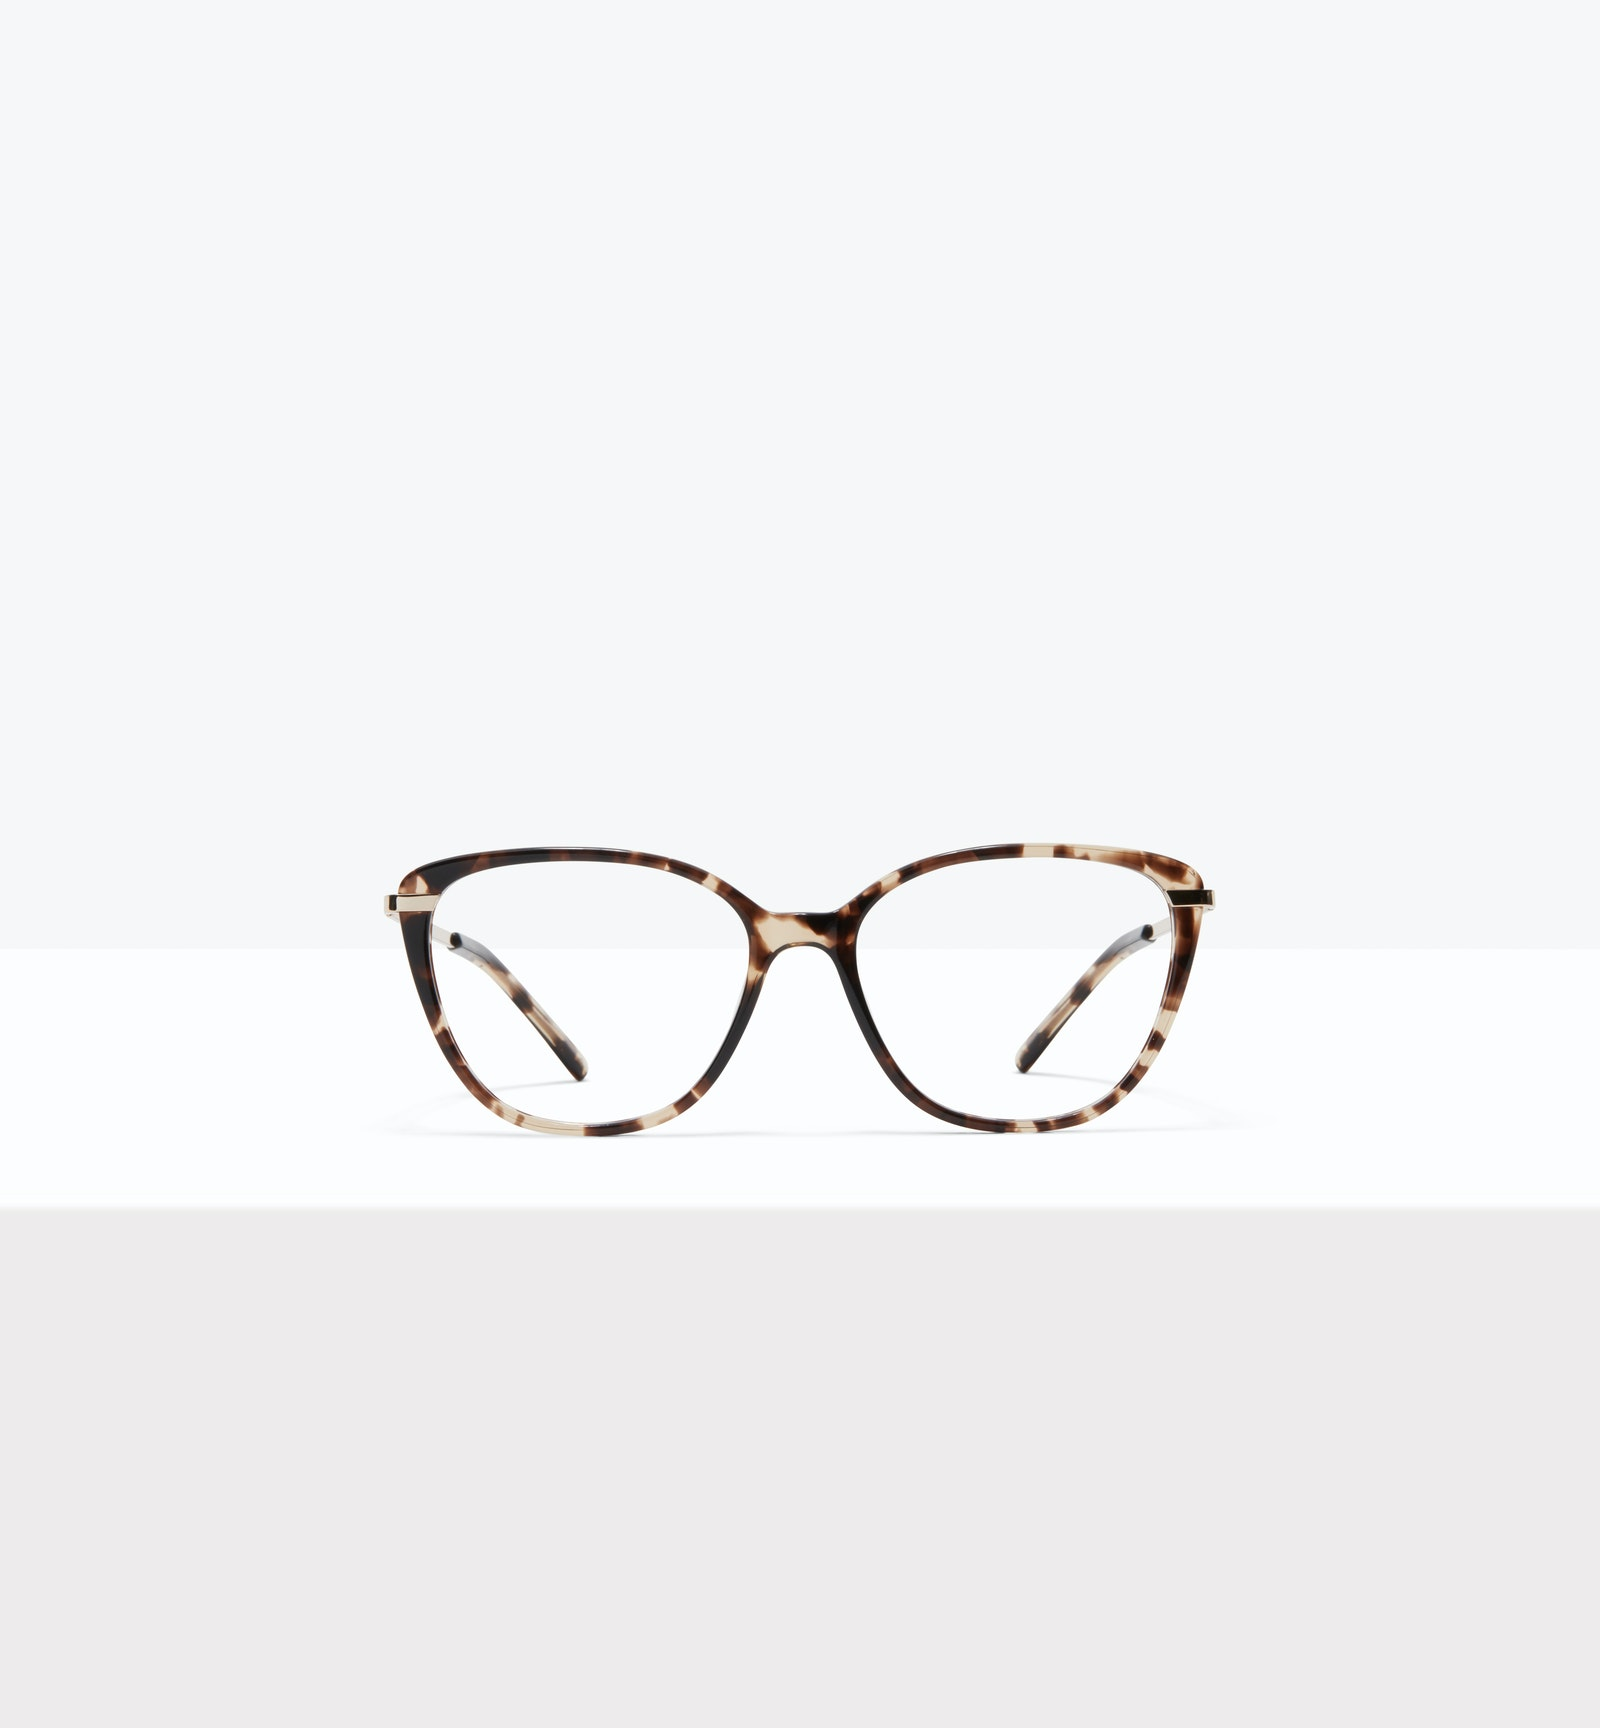 Affordable Fashion Glasses Rectangle Square Eyeglasses Women Illusion L Leopard